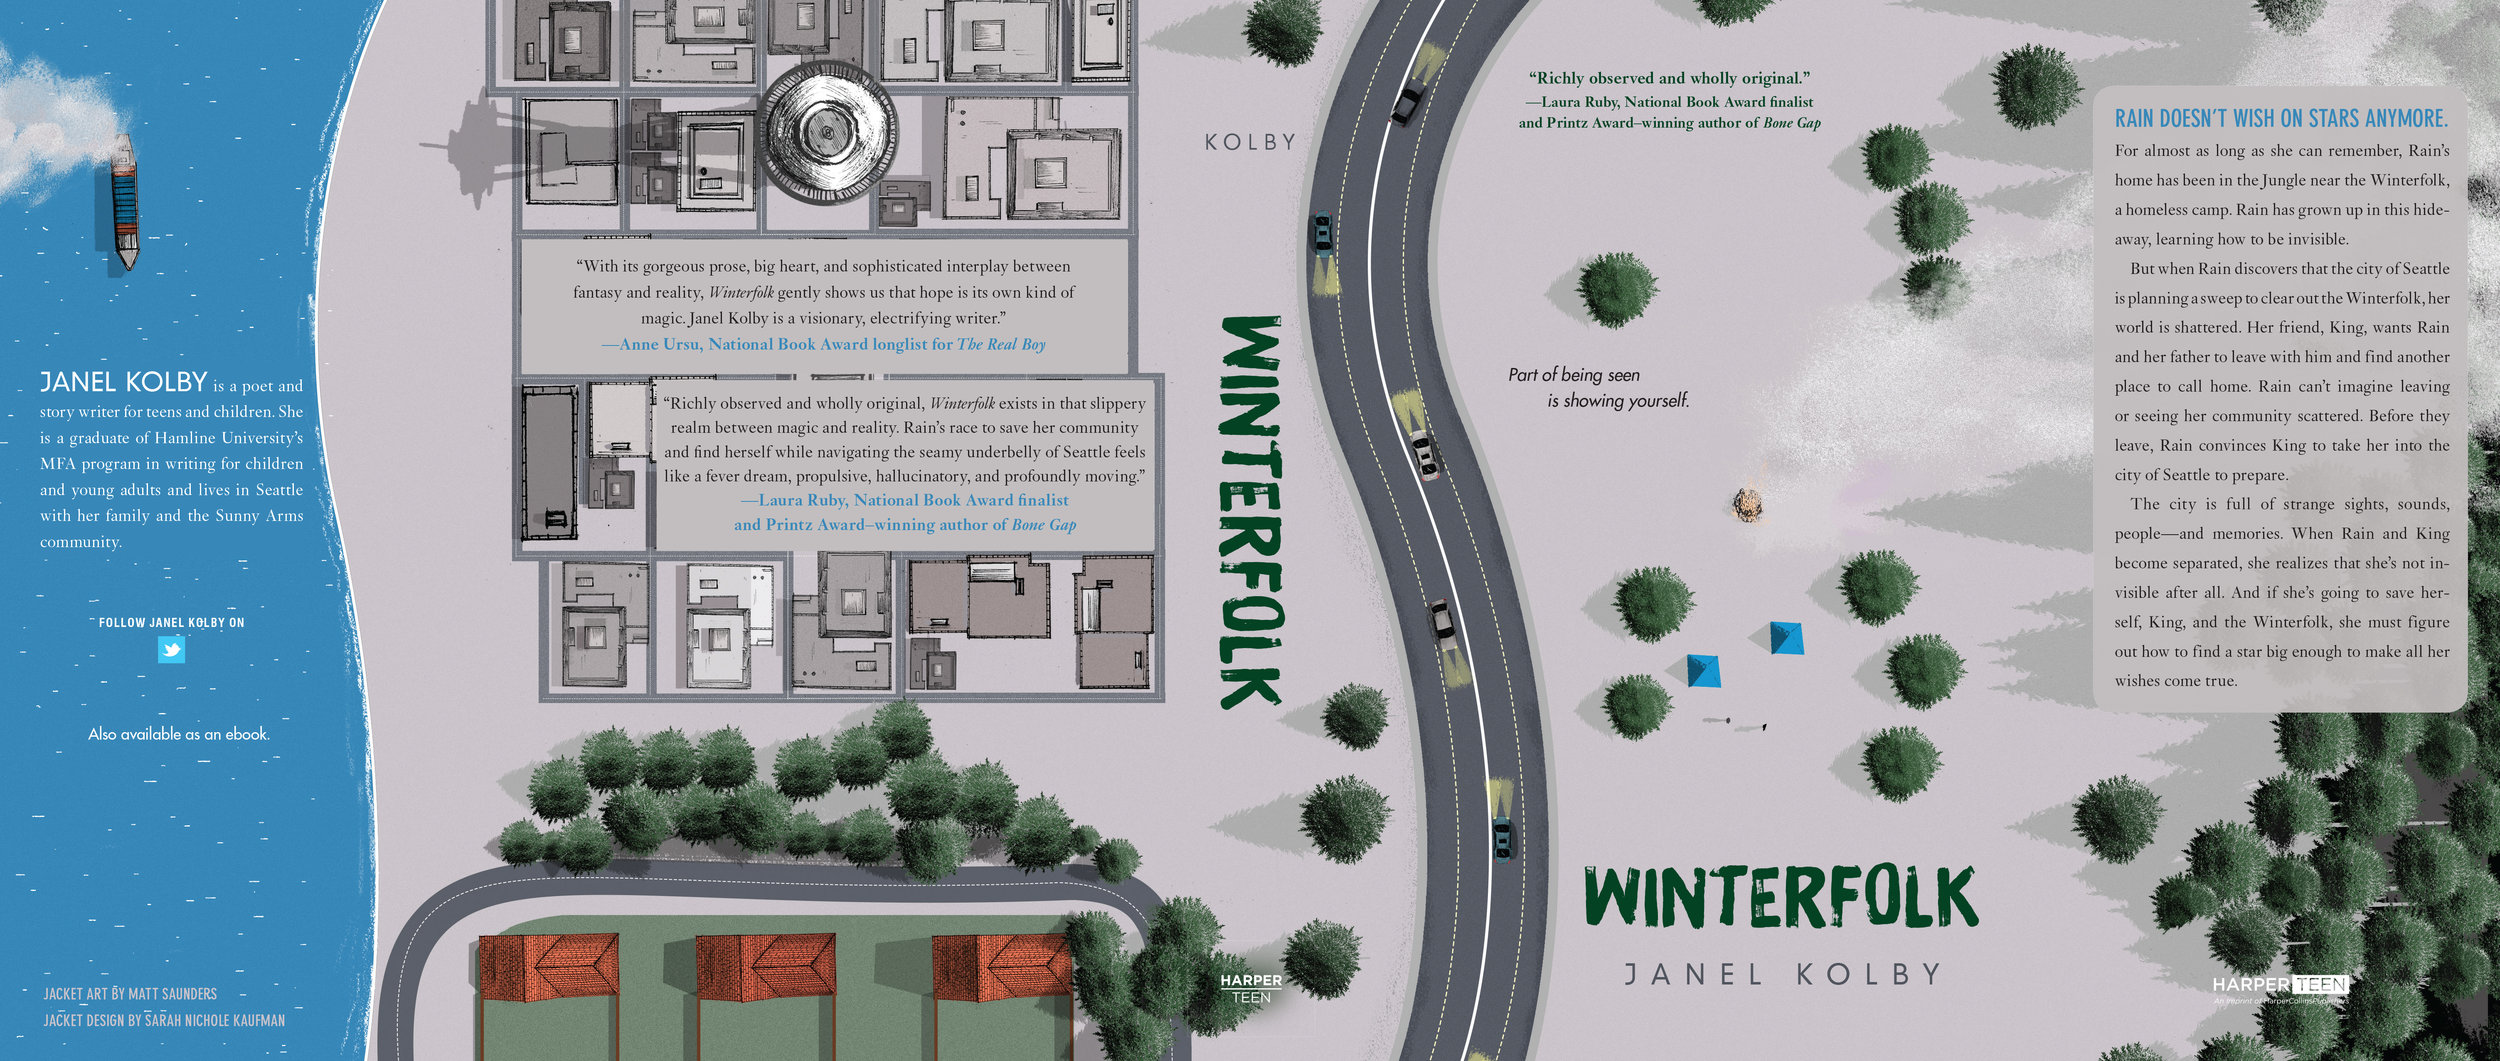 Winterfolk_jkt_2.jpg